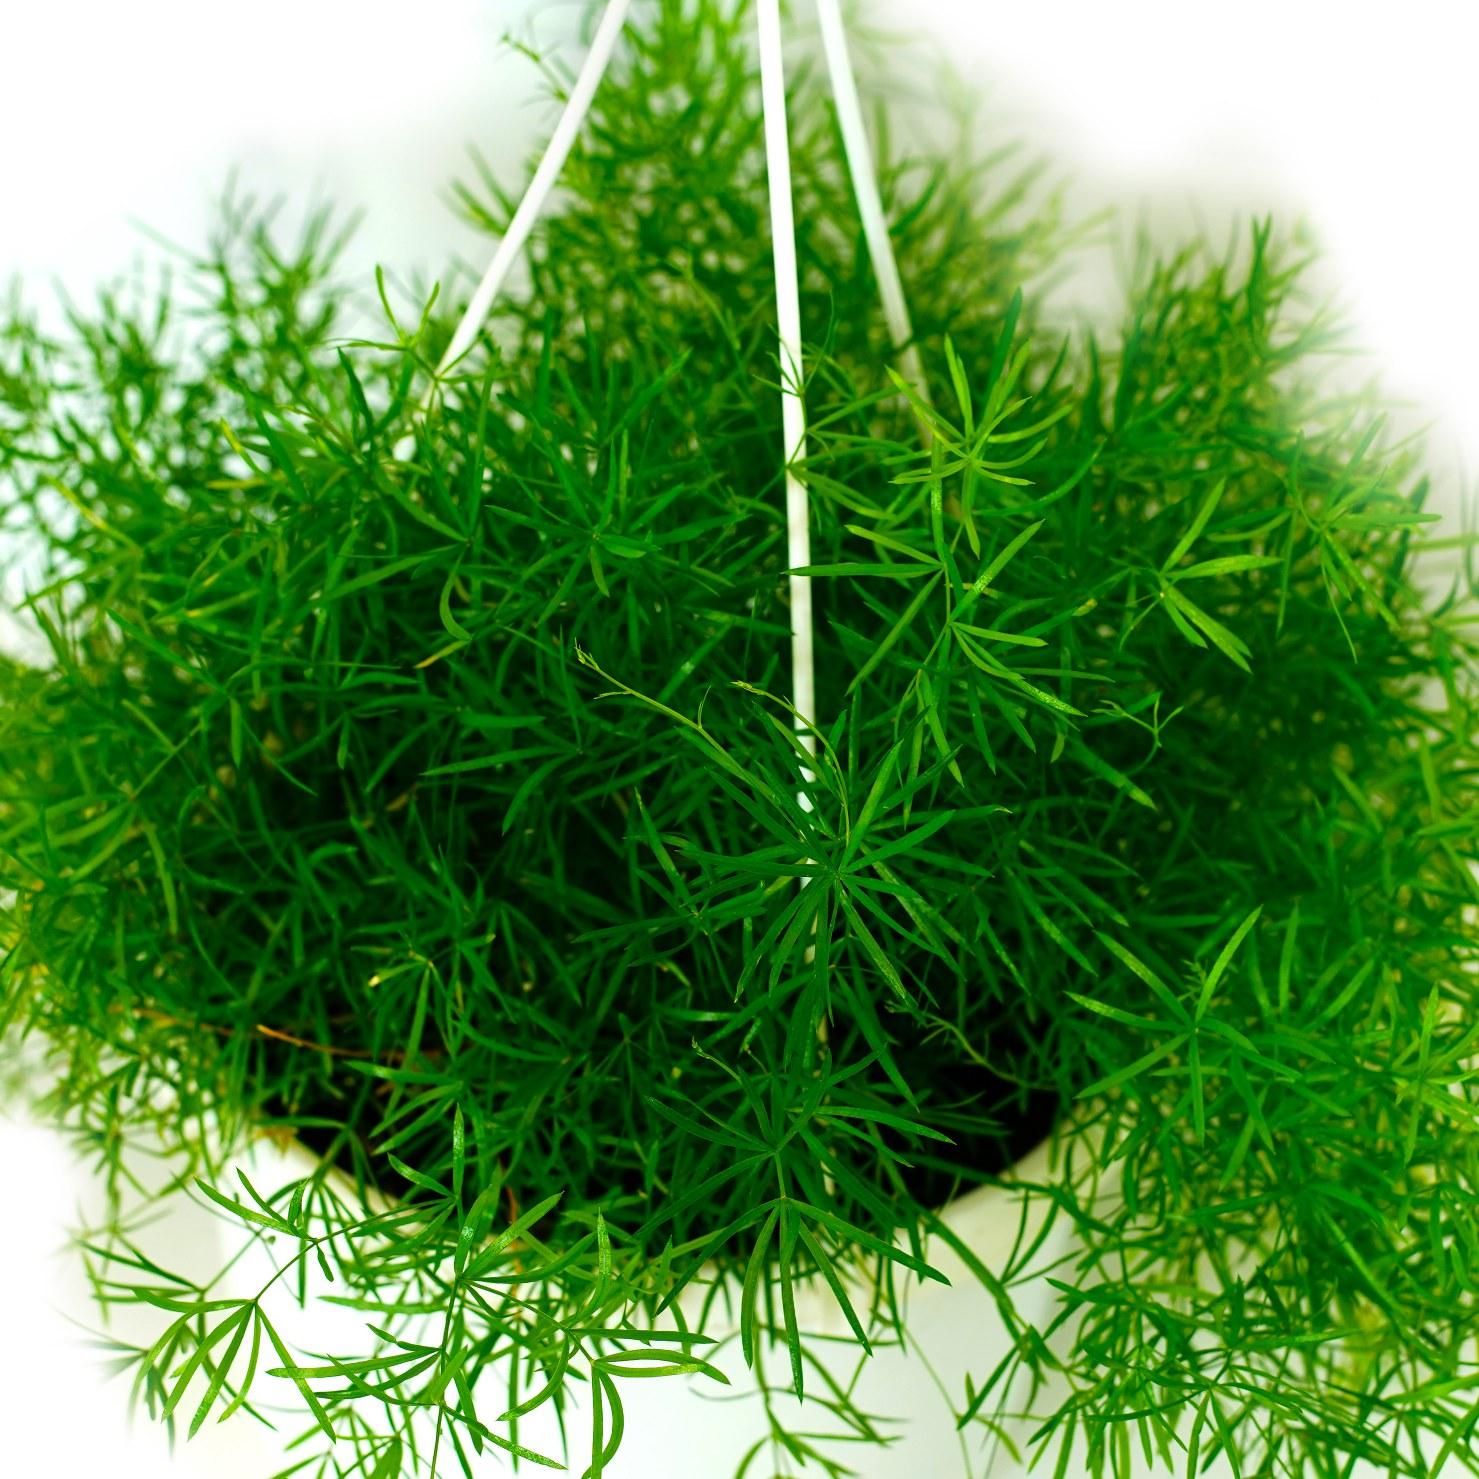 Sprengeri Asparagus Indoor Plants Hanging